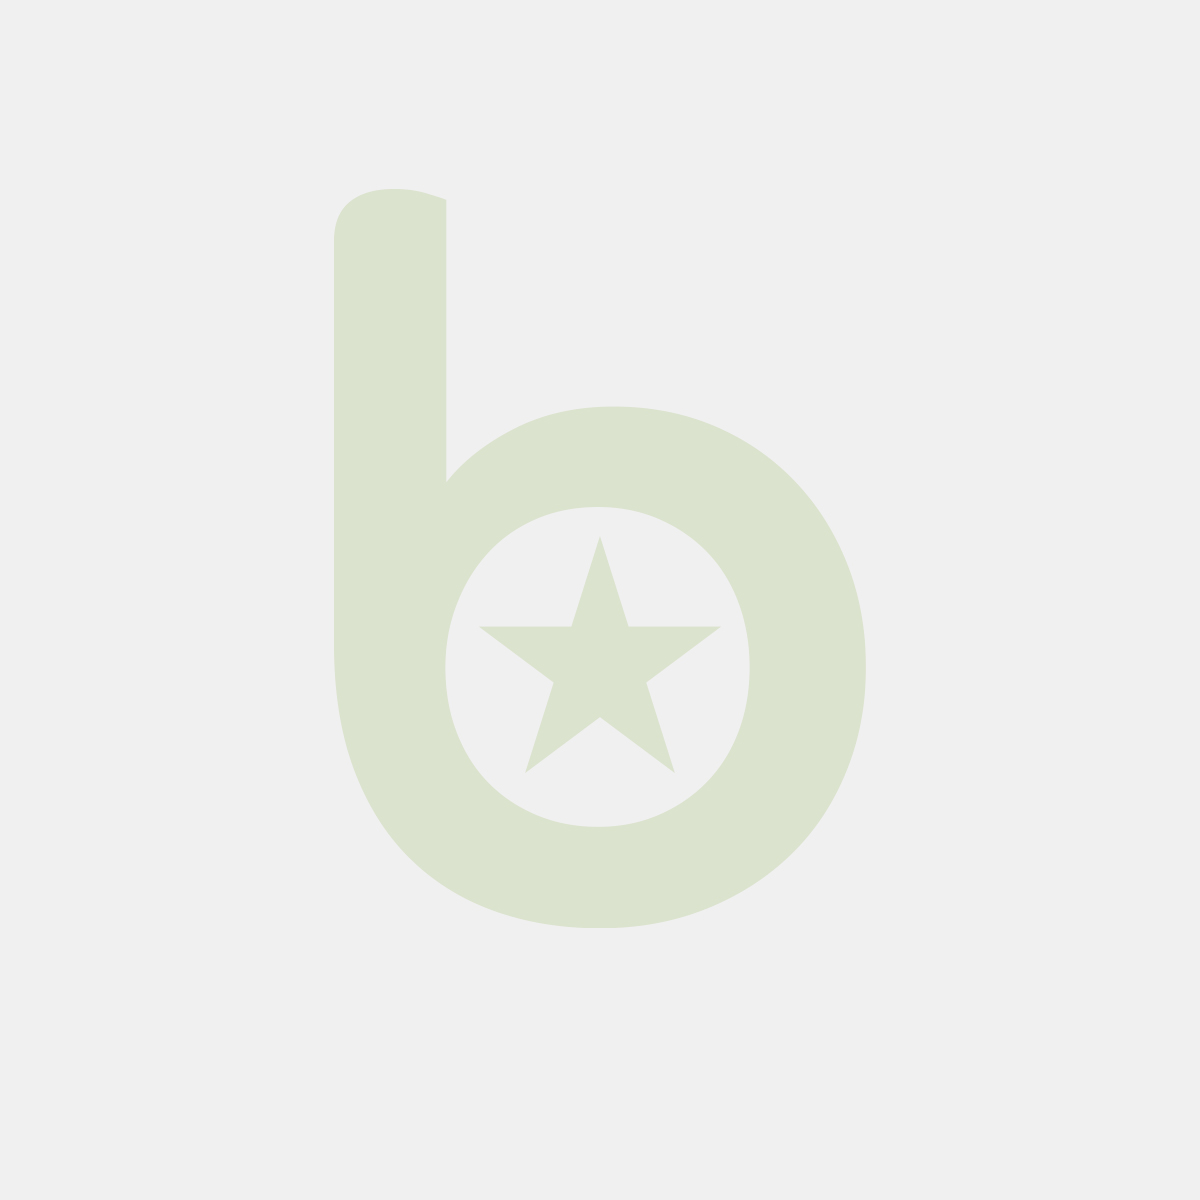 Nadstawa chłodnicza GN 1/3 6 x GN 1/3